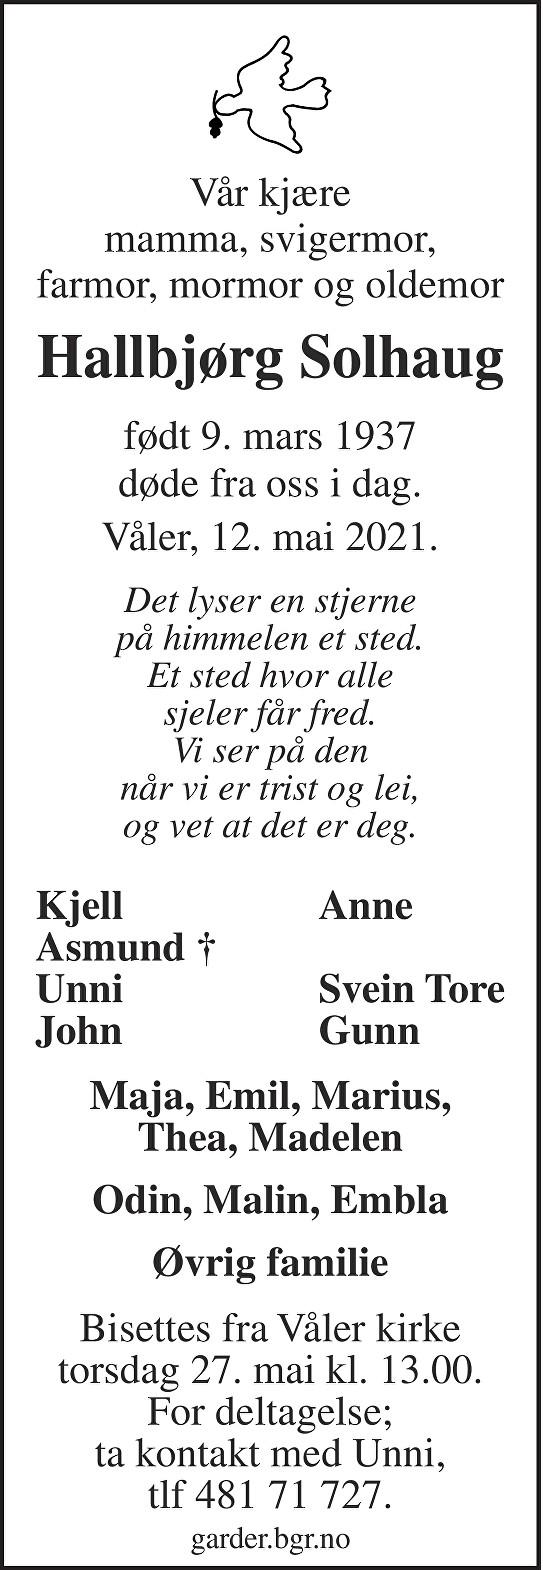 Hallbjørg Solhaug Dødsannonse